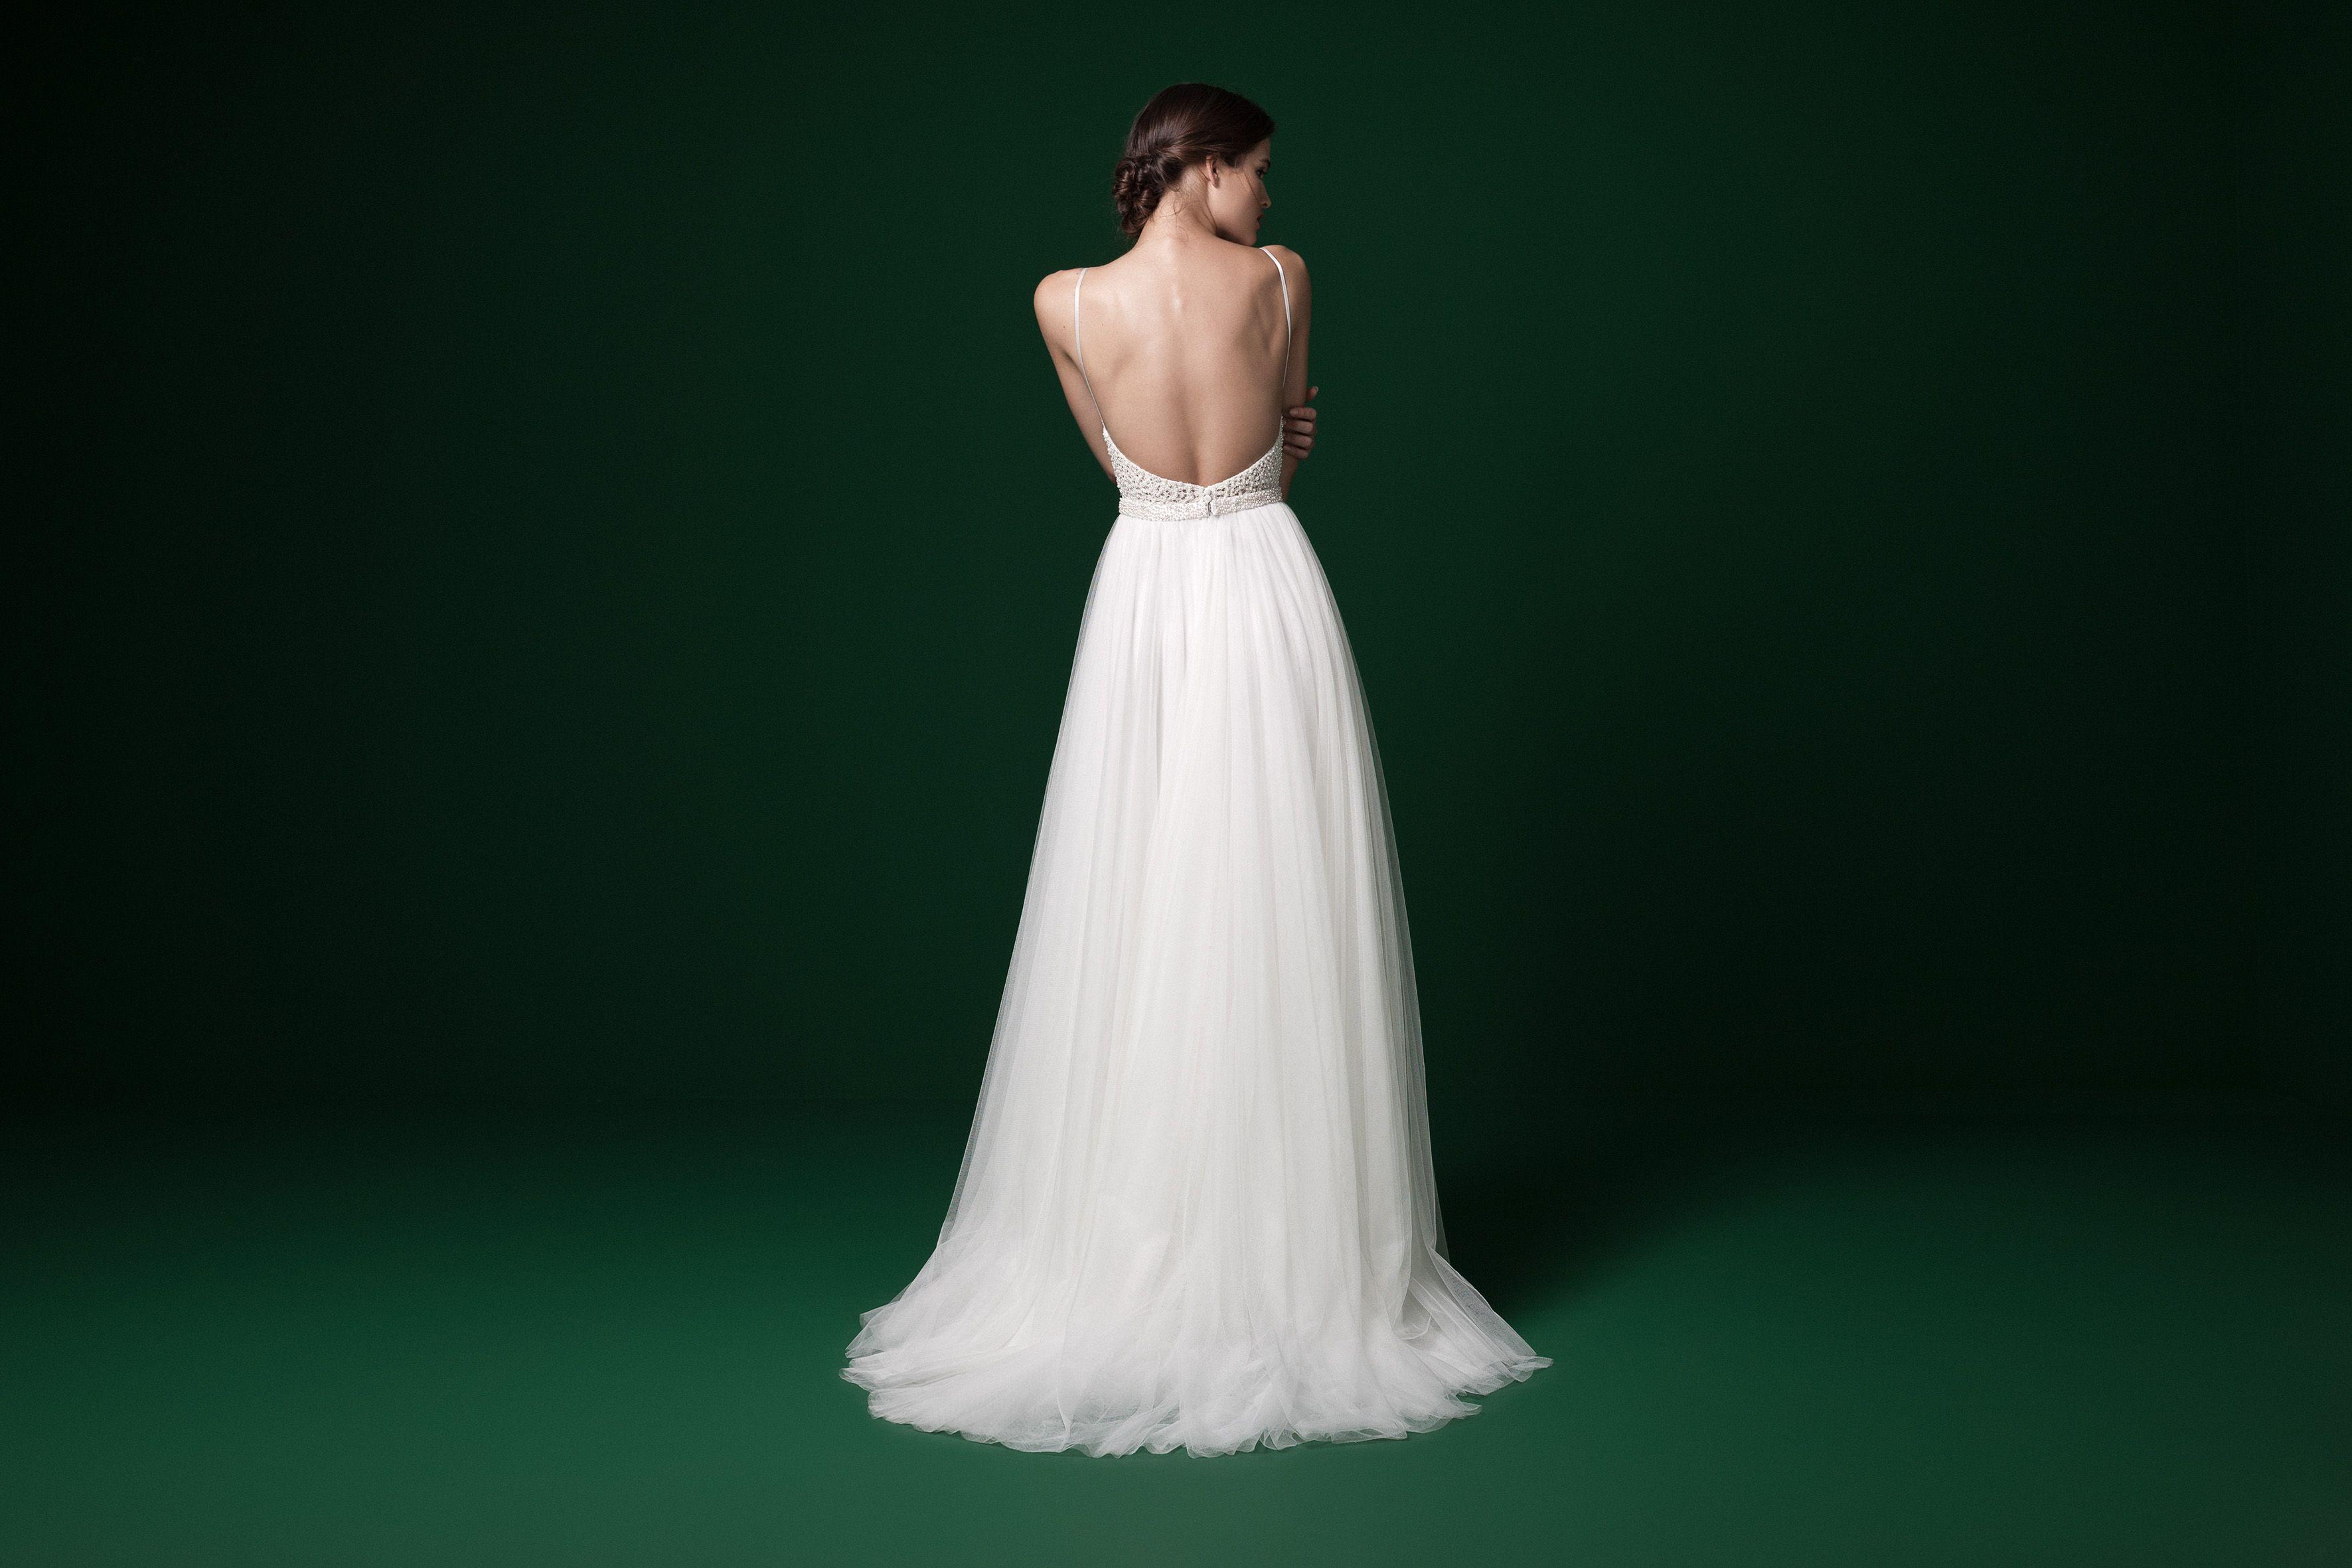 4c66ddaa378c Daalarna Couture | PRD 246 | Available at Sash & Bustle  #openbackweddingdress #thinstraps #uniqueweddingdress #silktulleskirt  #romanticbride #indiebride # ...